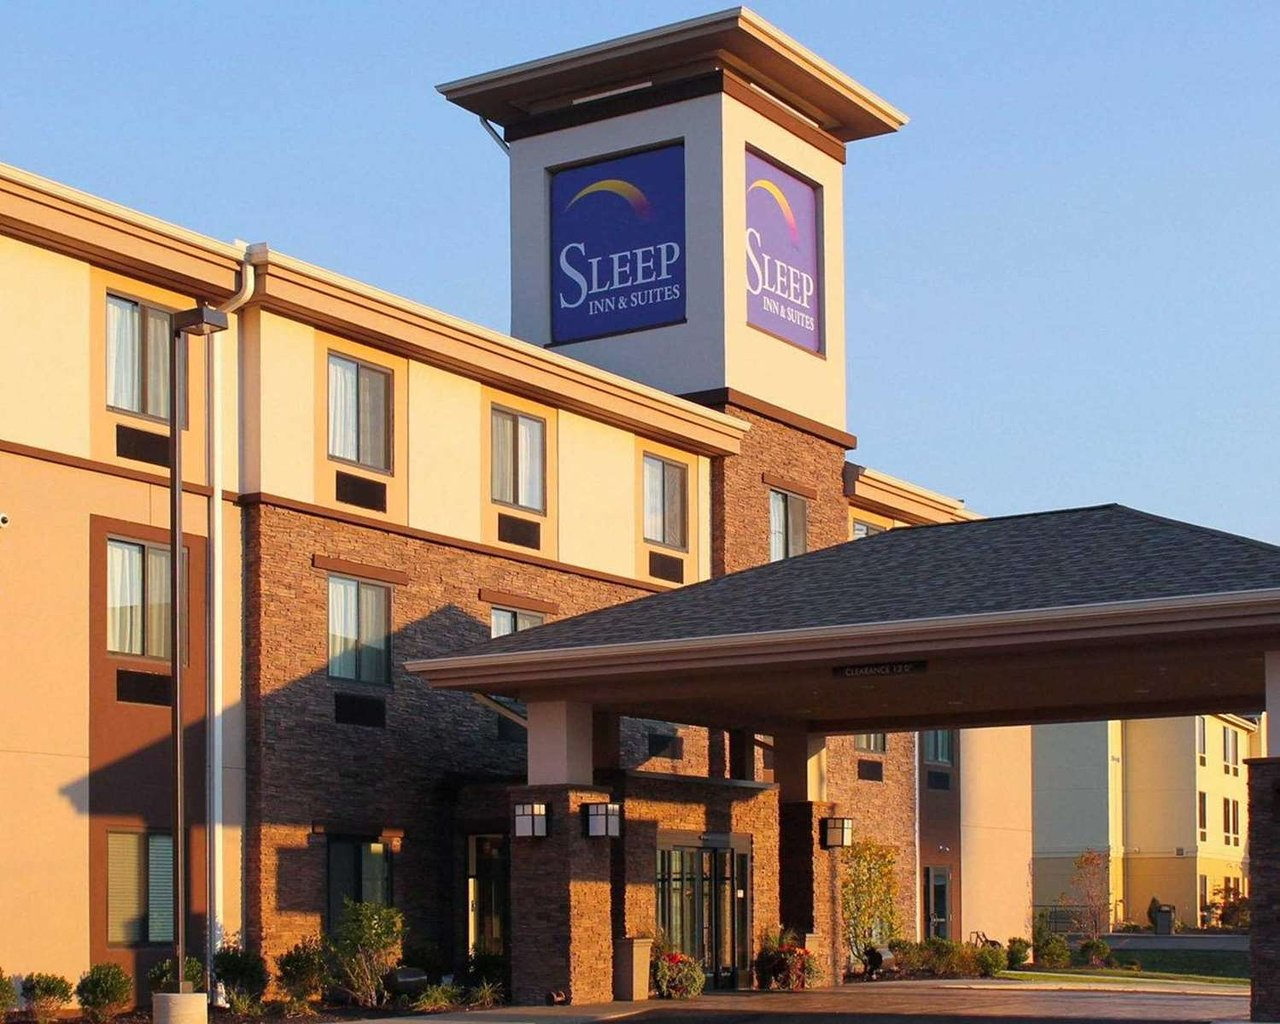 Sleep Inn Suites 67 8 Prices Hotel Reviews Cambridge Ohio Tripadvisor